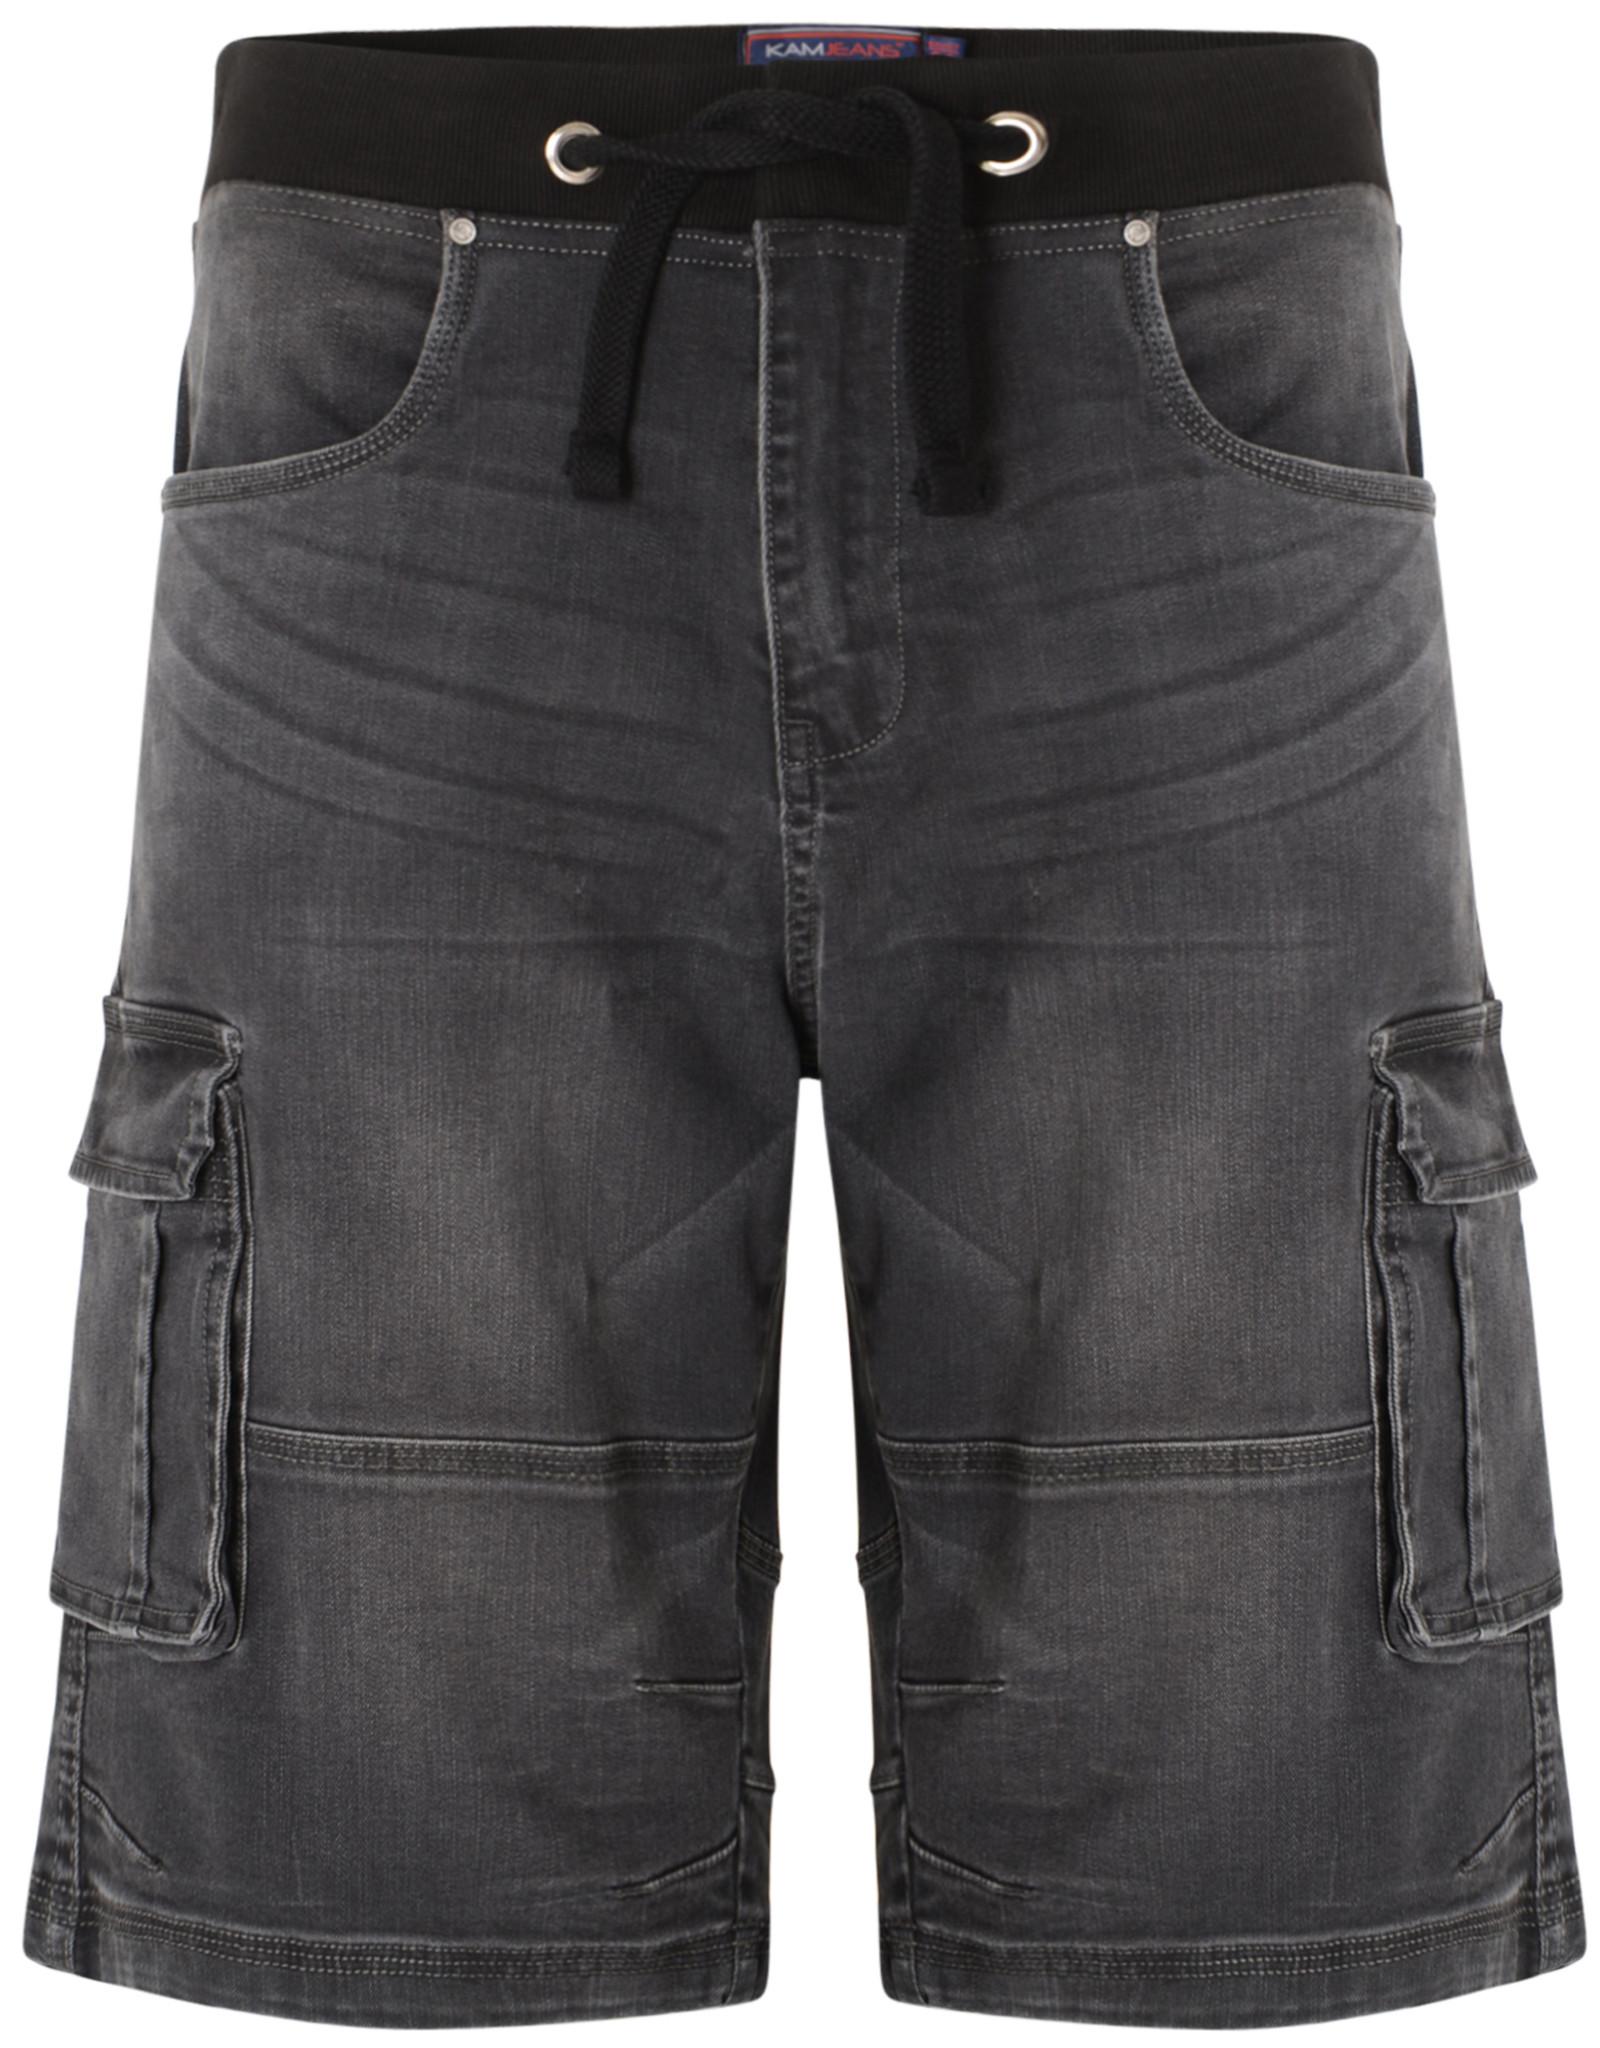 Kam Jeans Denim stretch SHORT - antraciet